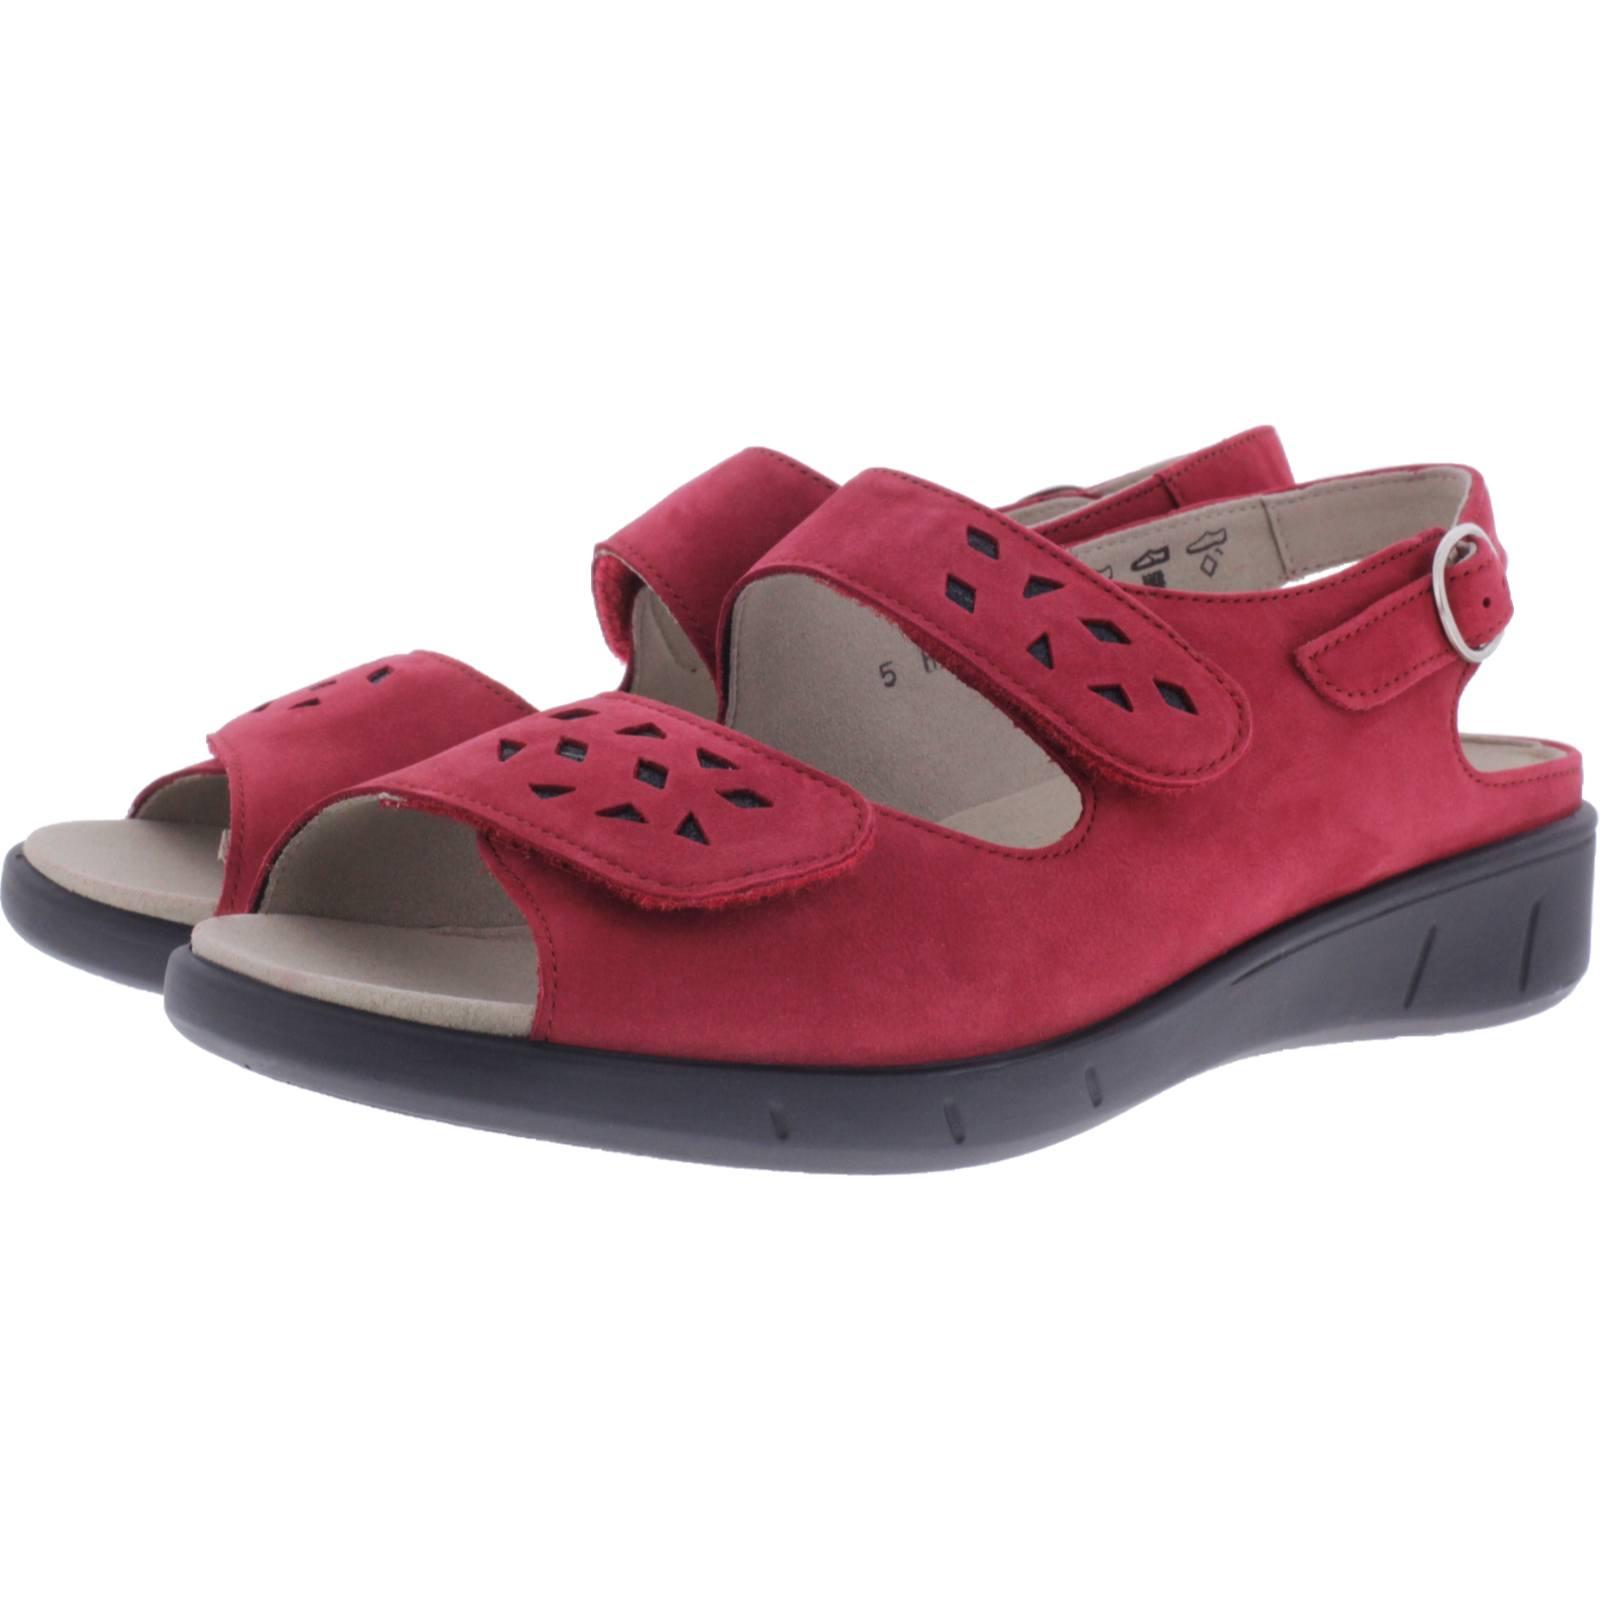 solidus sandalen happy chili schwarz damen 23000 50249. Black Bedroom Furniture Sets. Home Design Ideas